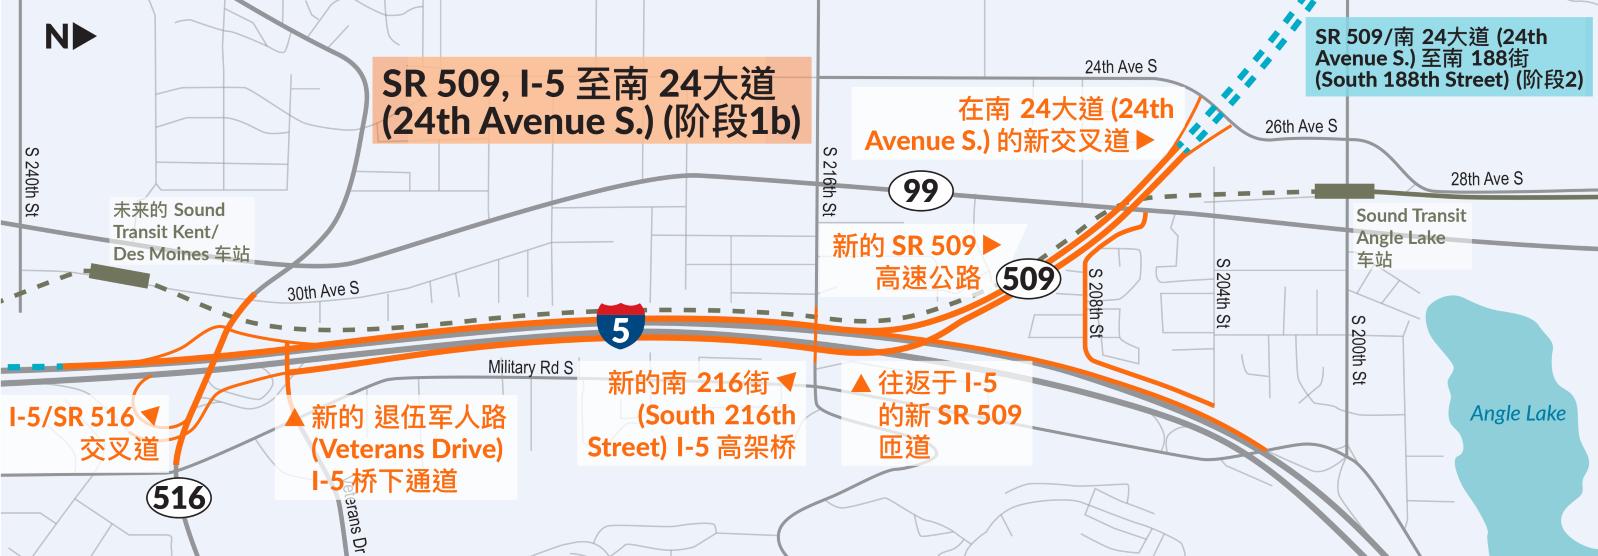 SR 509,I-5至南24大道(24th Avenue S.